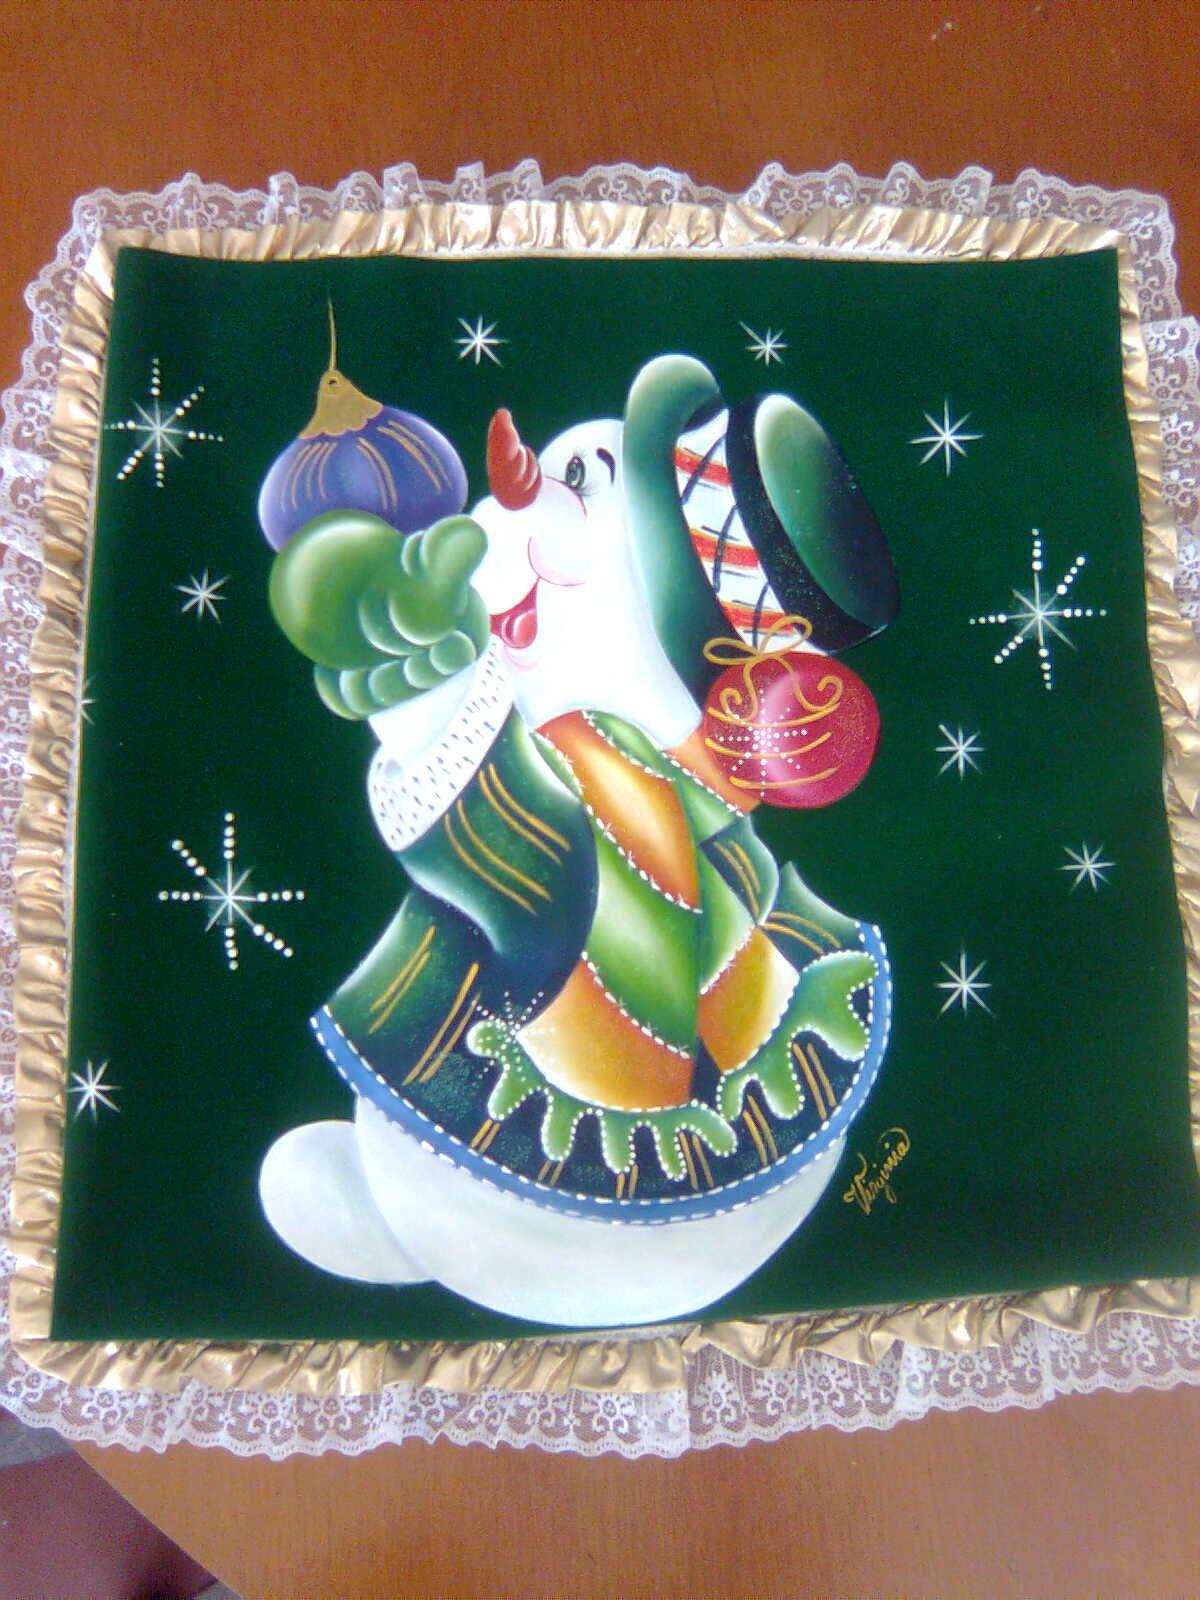 Navidad elaborado con t cnica de pirograbado - Dibujos navidenos para pintar en tela ...